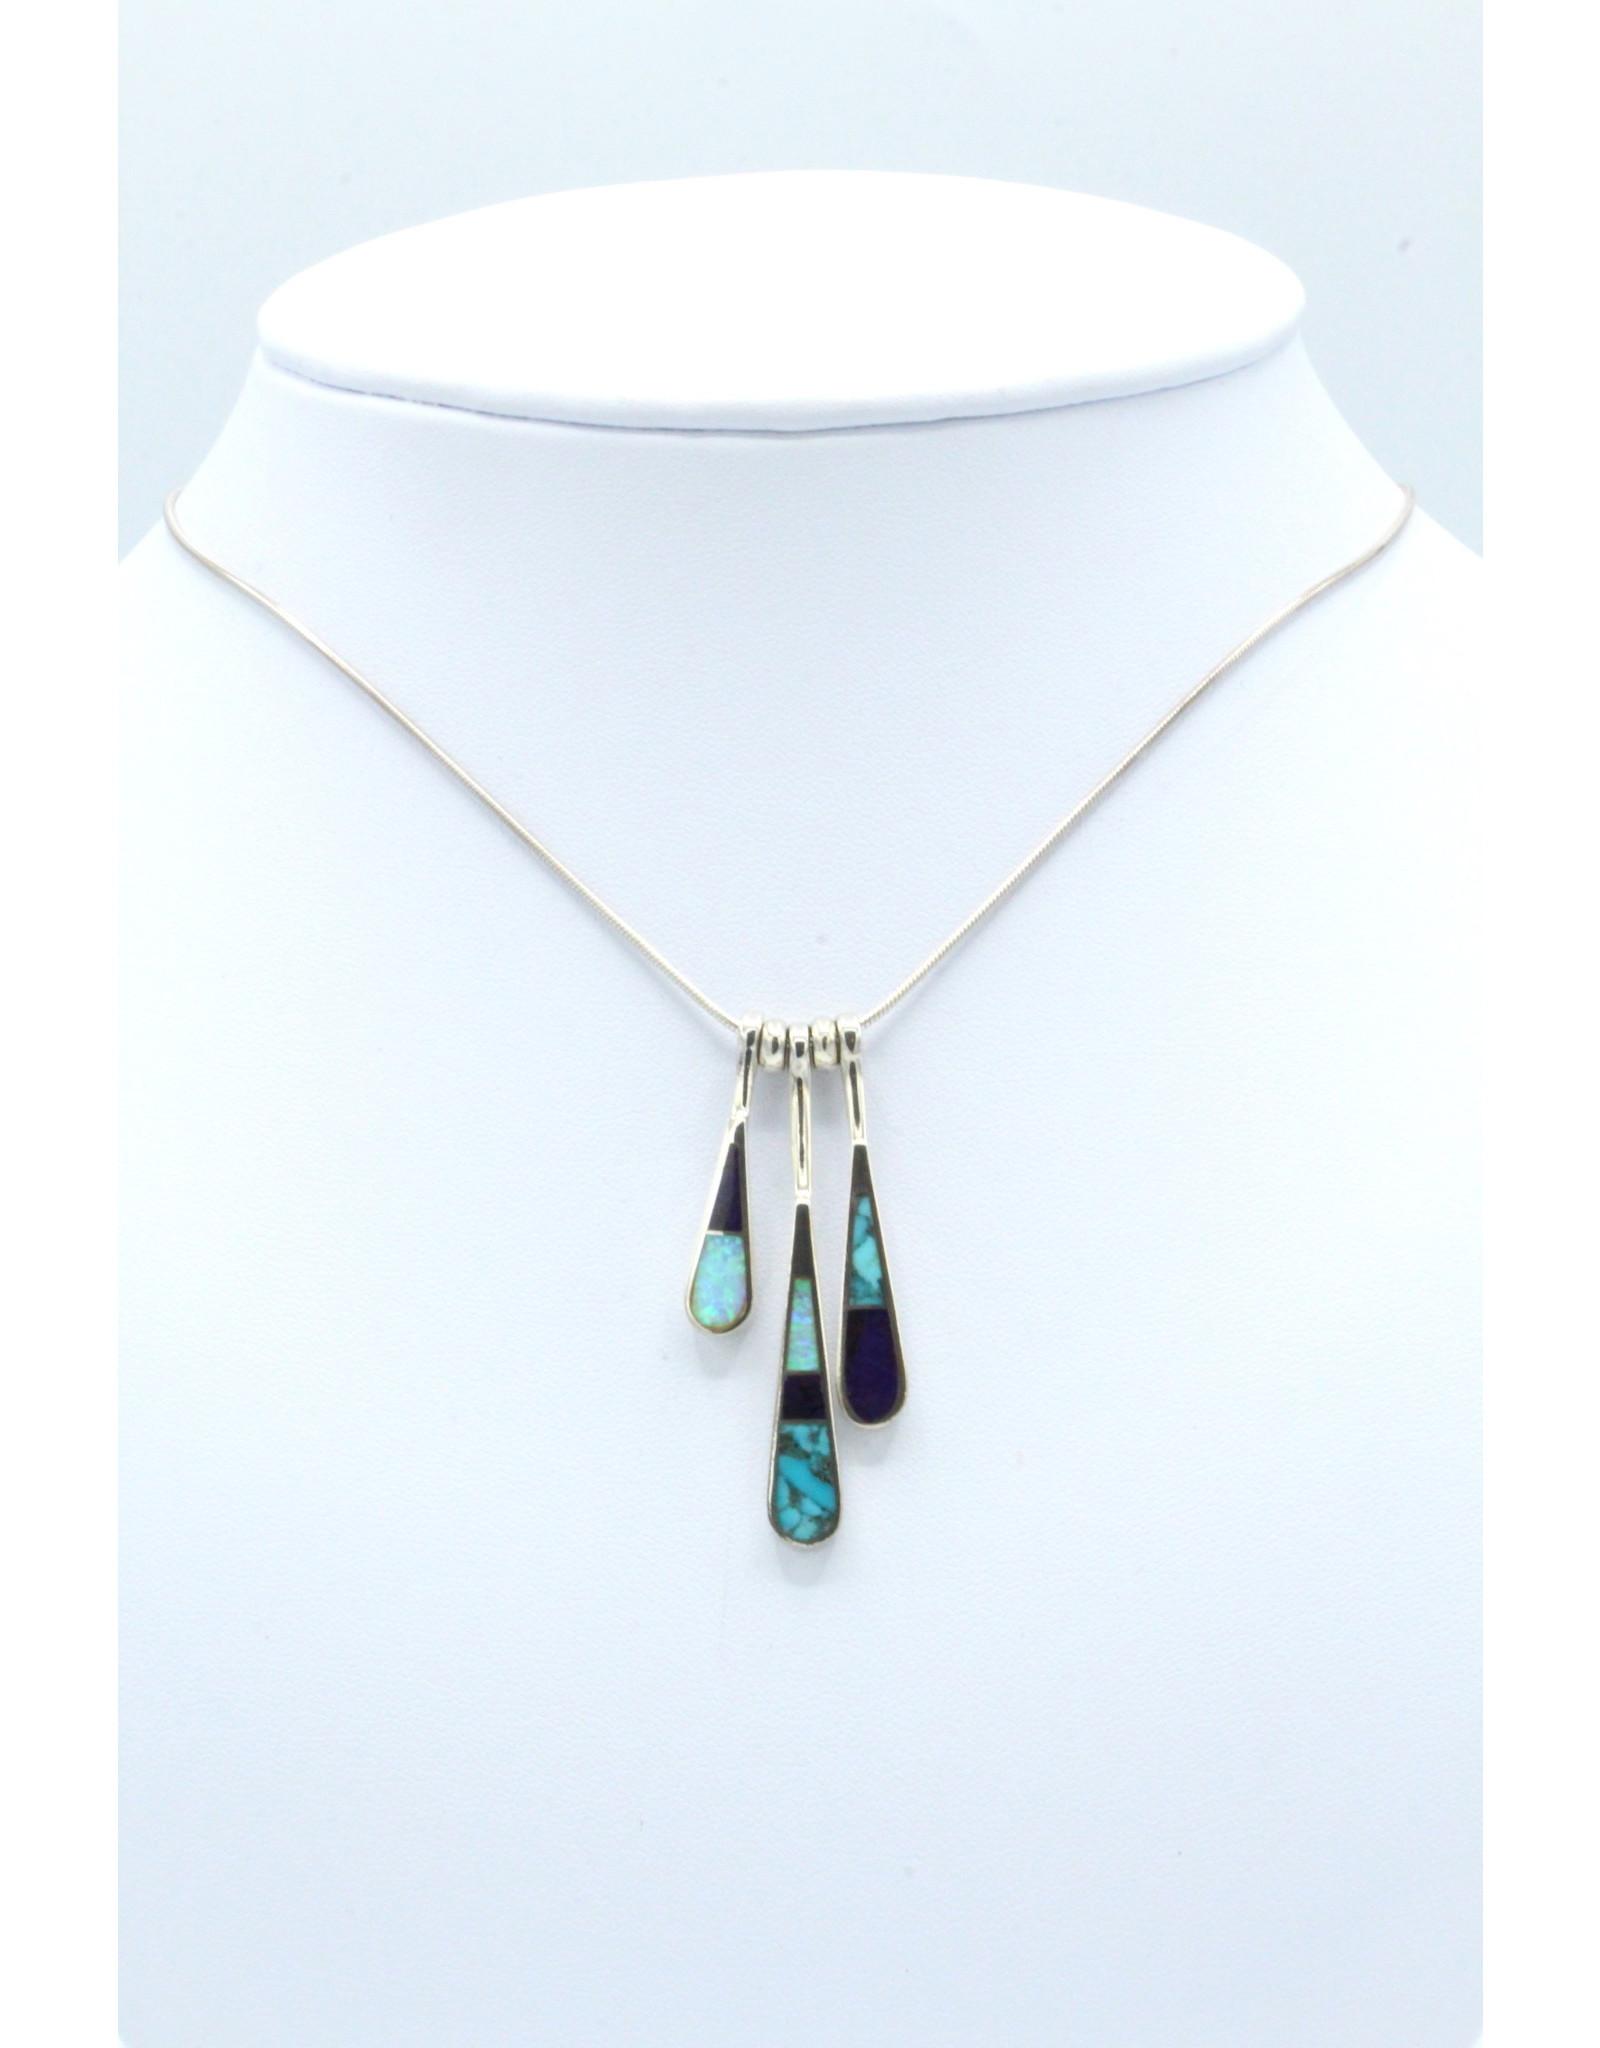 3 Tear Necklace - N108-51